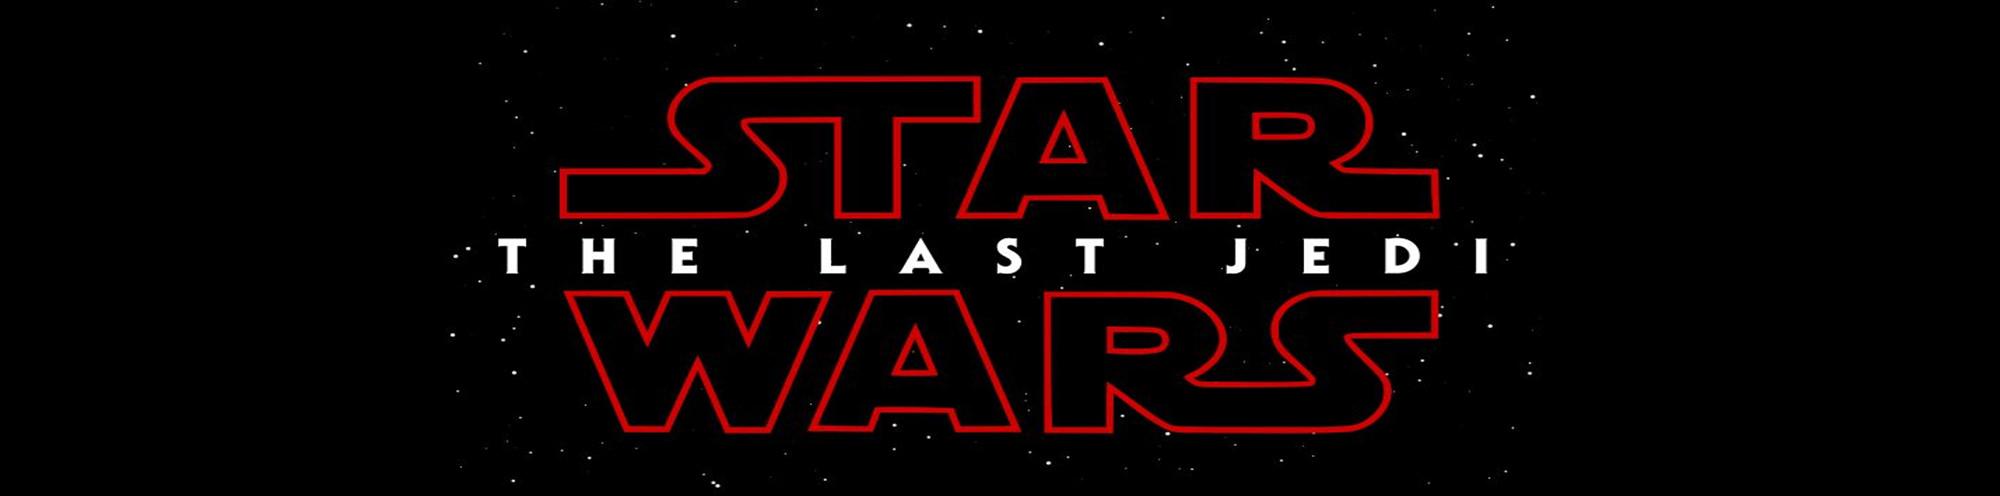 STAR-WARS-LAST-JEDI-cropped